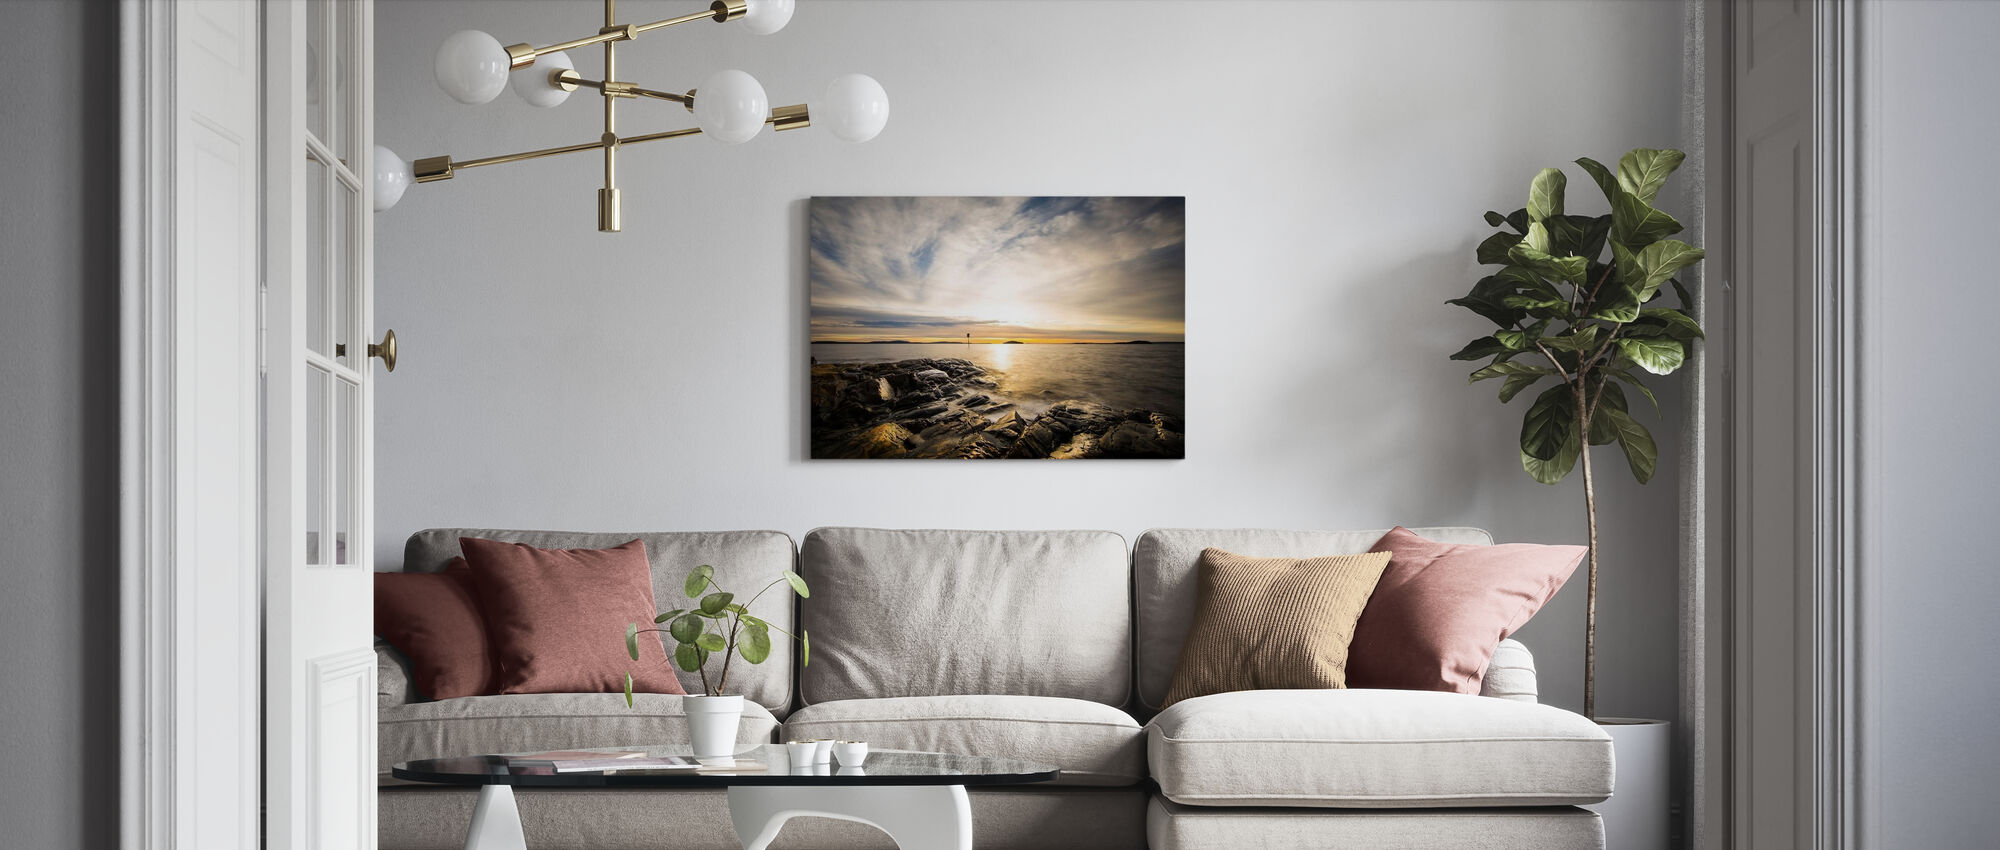 Winter Sunset - Canvas print - Living Room